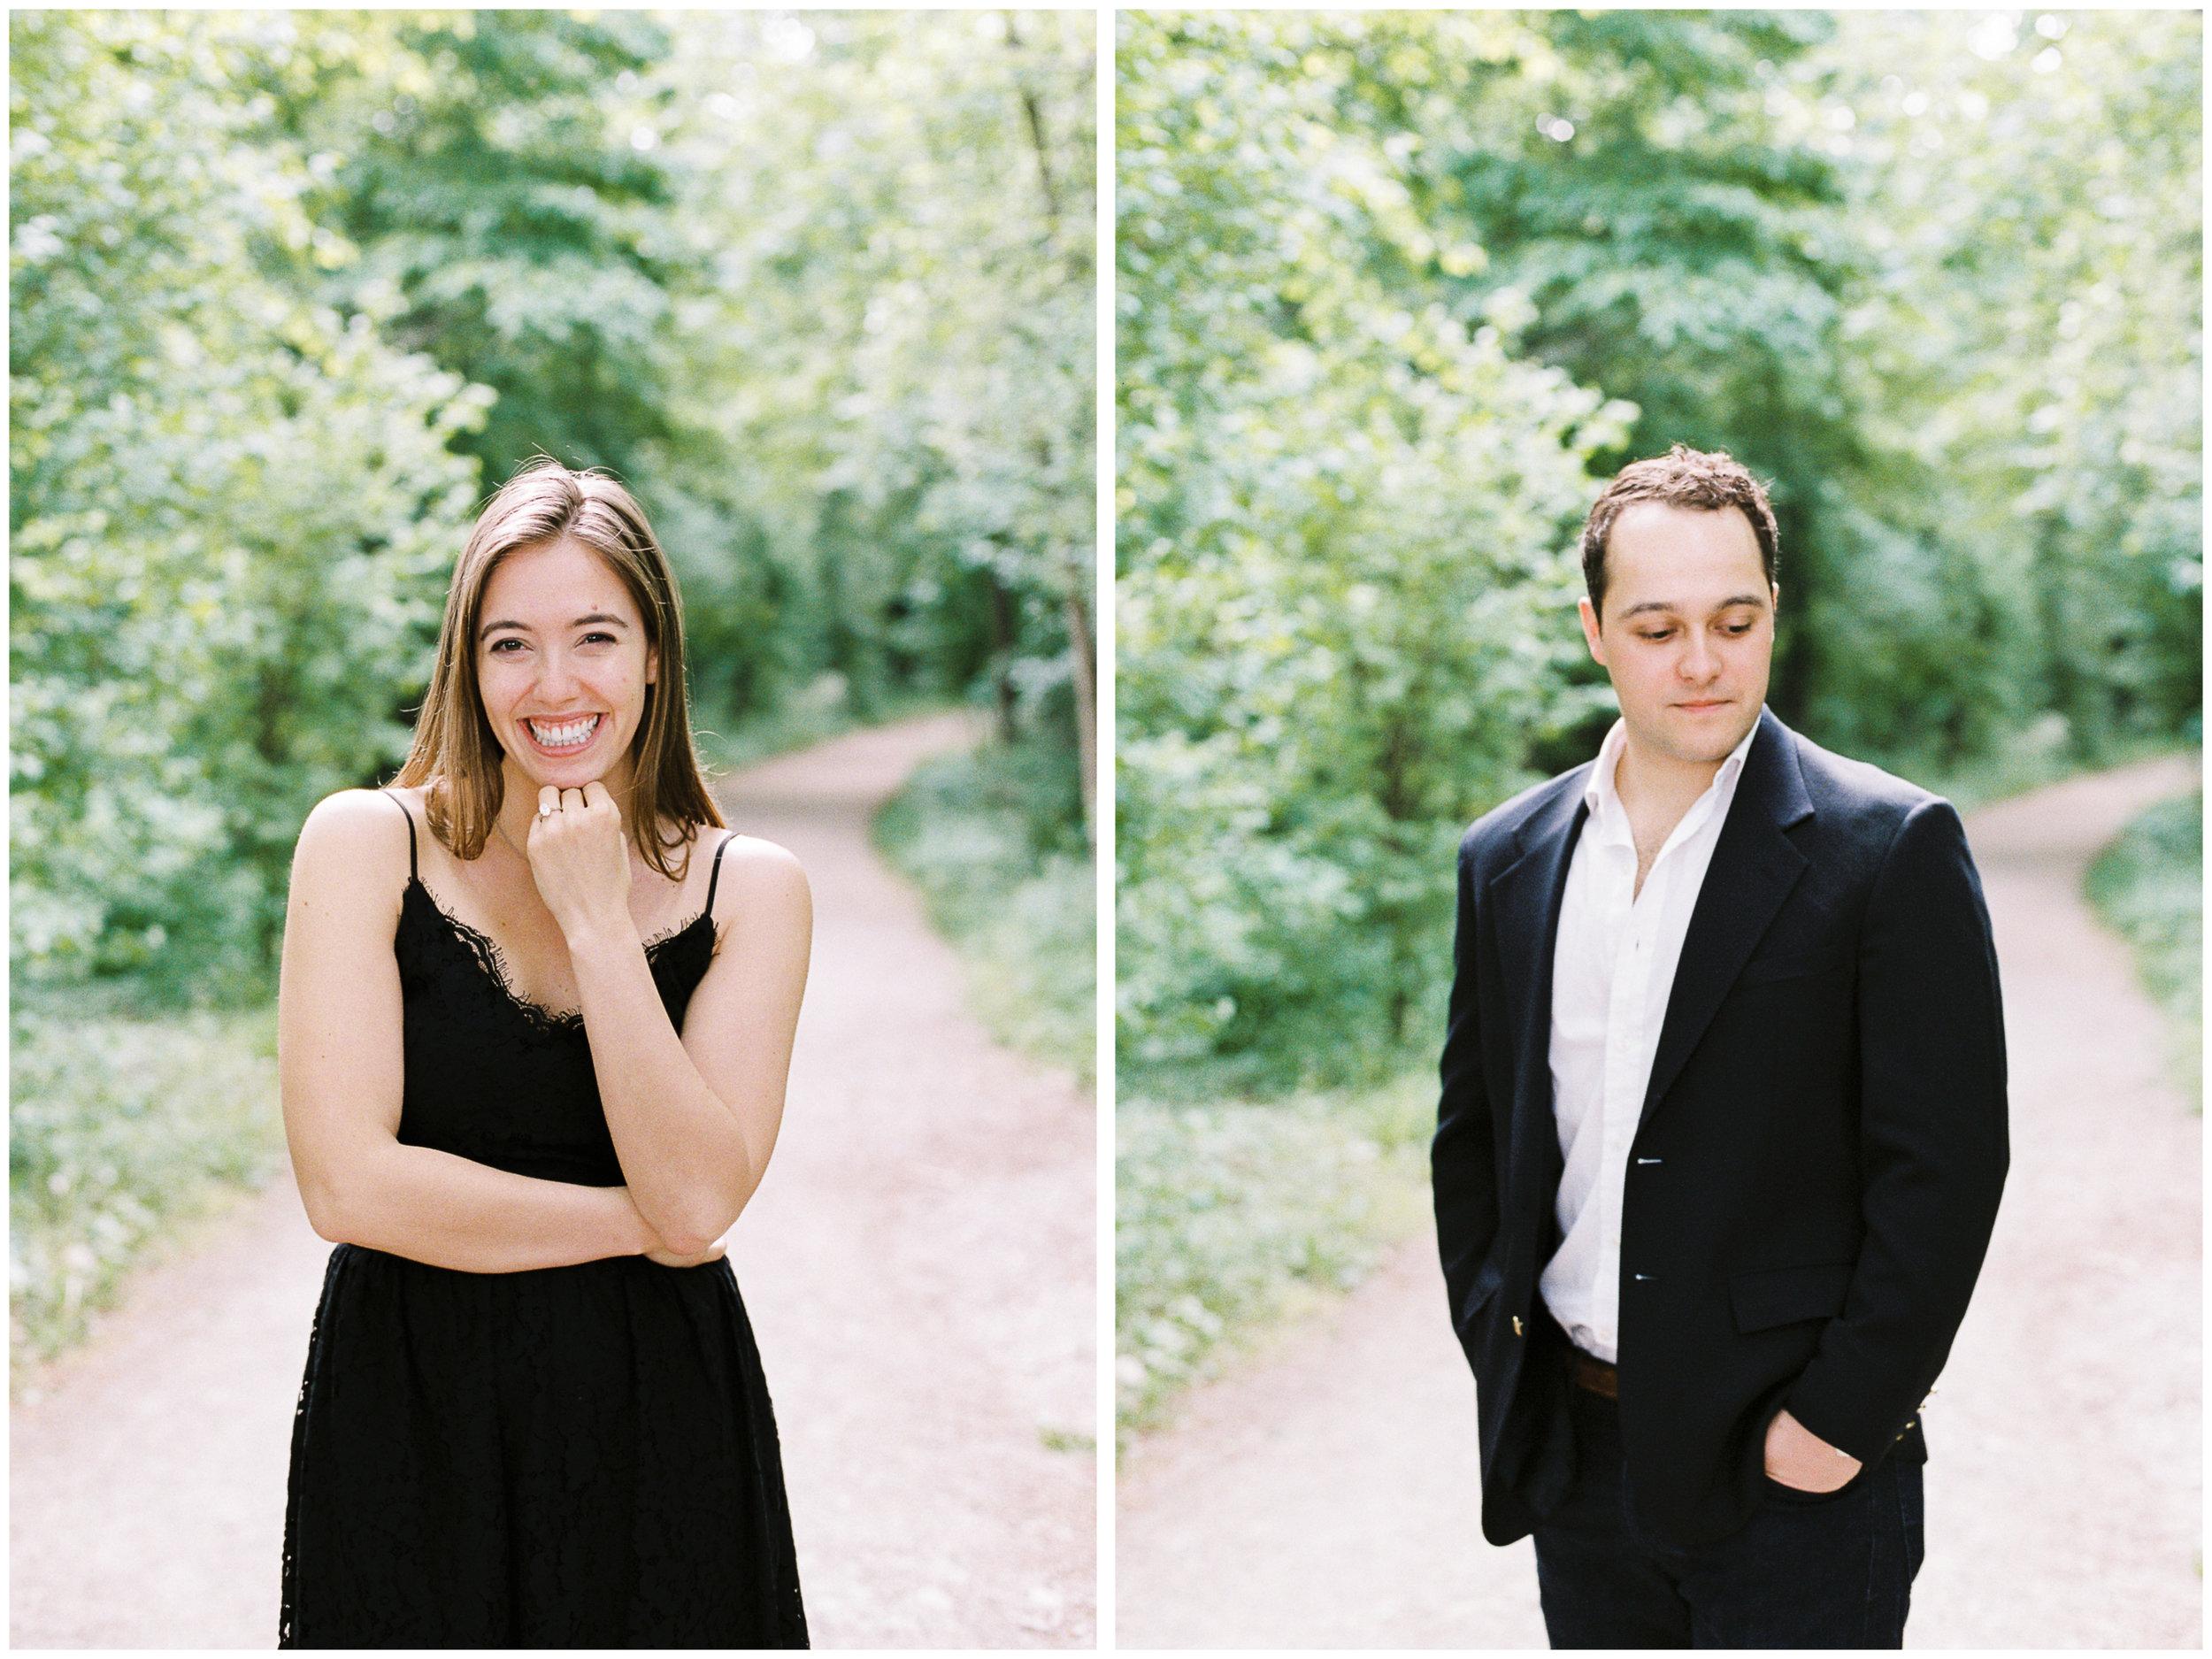 Secret Proposal Session | The Gloriette, Vienna | Michelle Mock Photography | Vienna Photographer | Contax 645 | Fuji400H